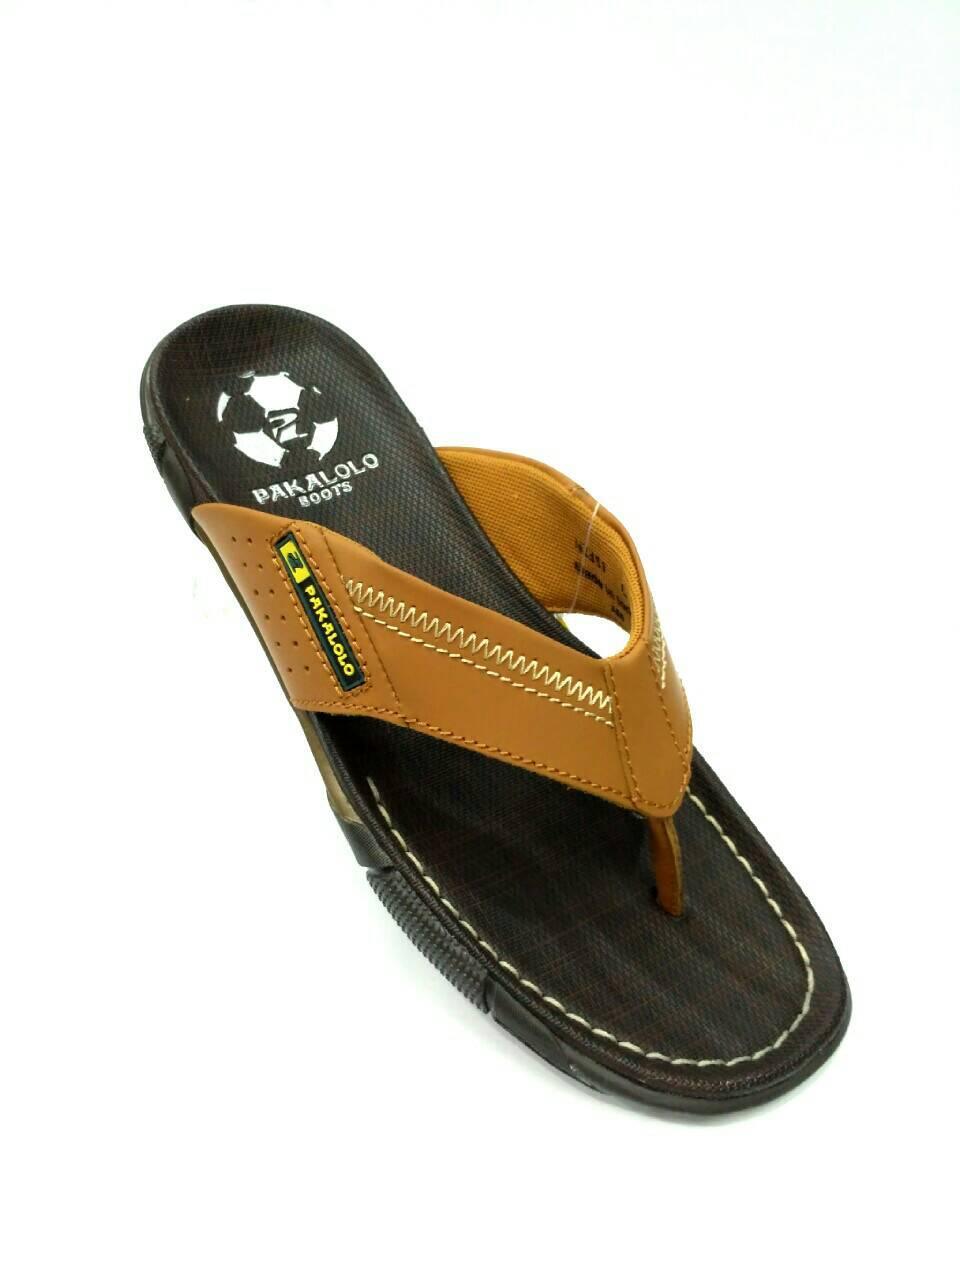 Sandal Kulit Pakalolo 2351 (619)